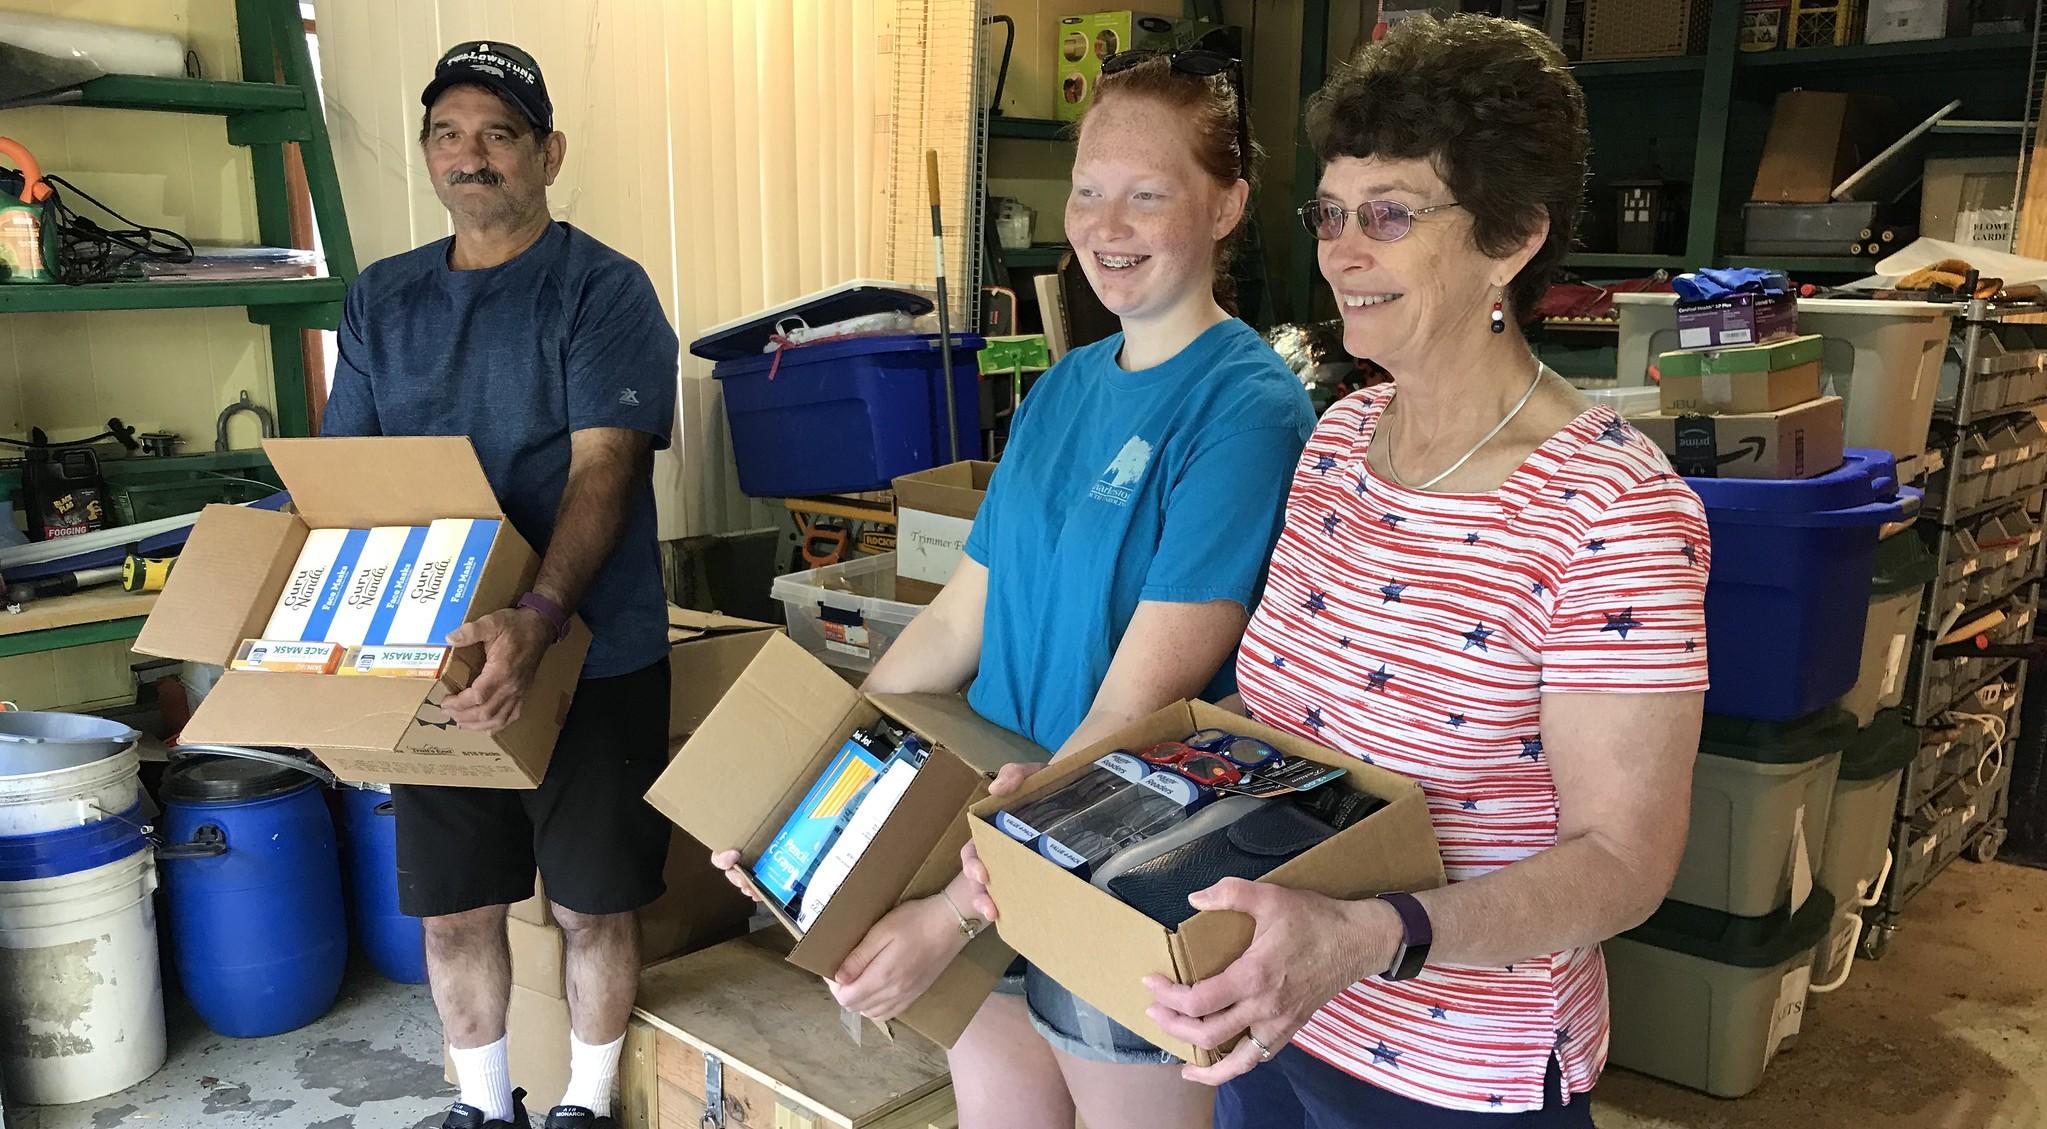 Volunteers helping to load supplies